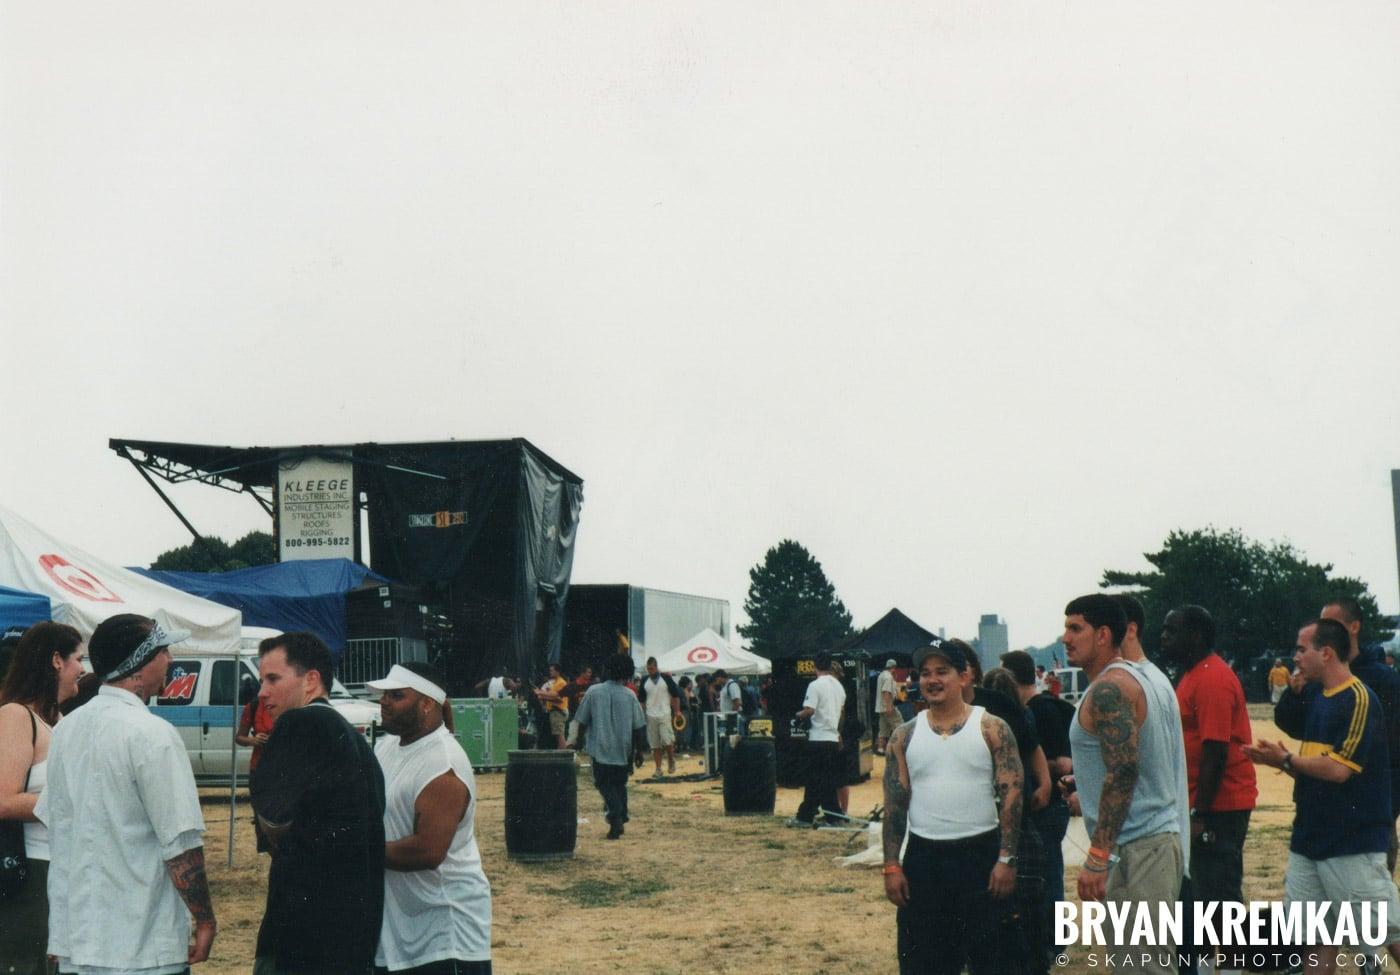 Crowd Shots @ Vans Warped Tour, Randall's Island, NYC - 8.4.01 (4)